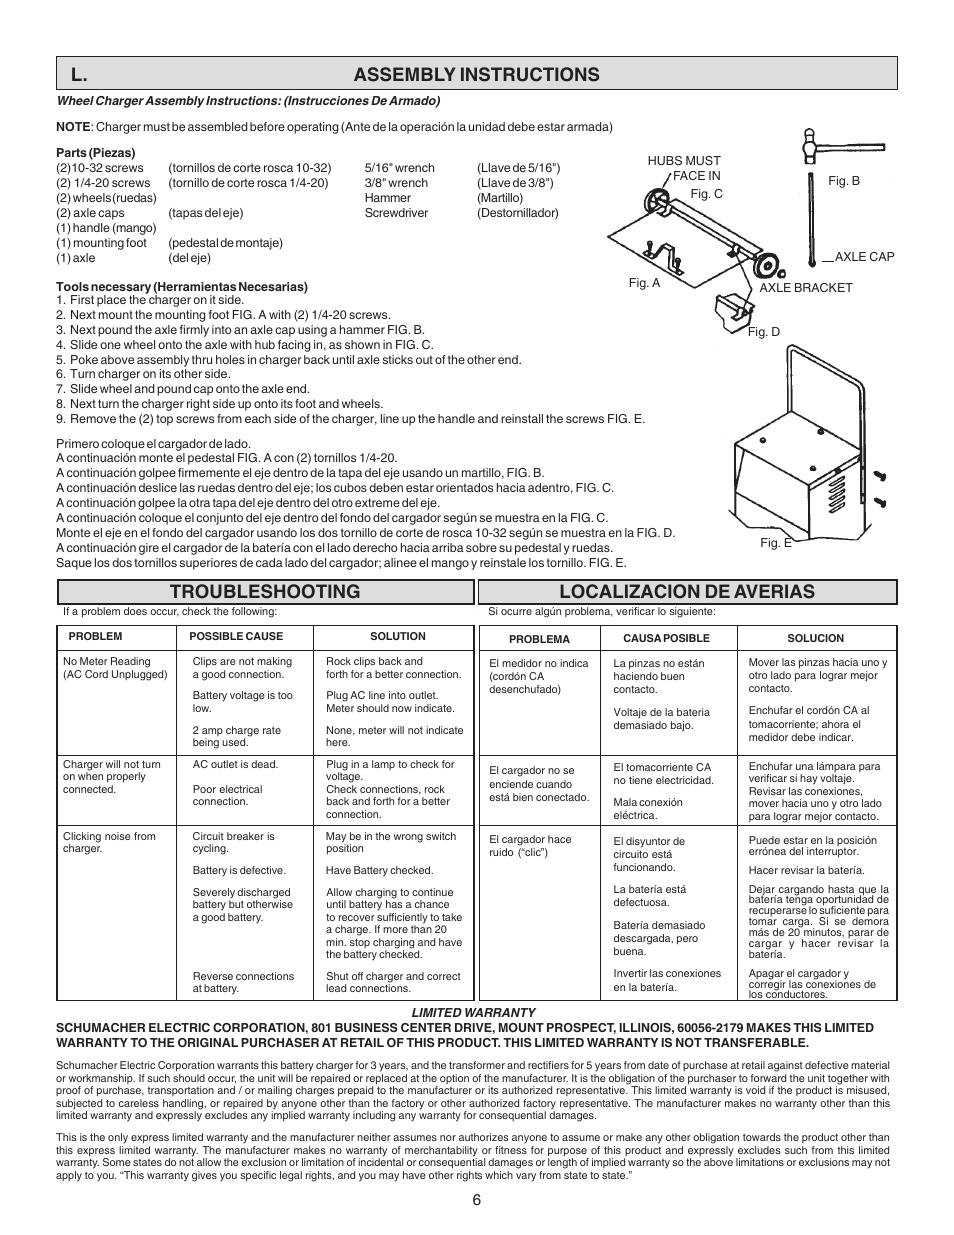 l assembly instructions localizacion de averias troubleshooting rh manualsdir com schumacher se 4022 user manual schumacher xp400 jump starter user manual